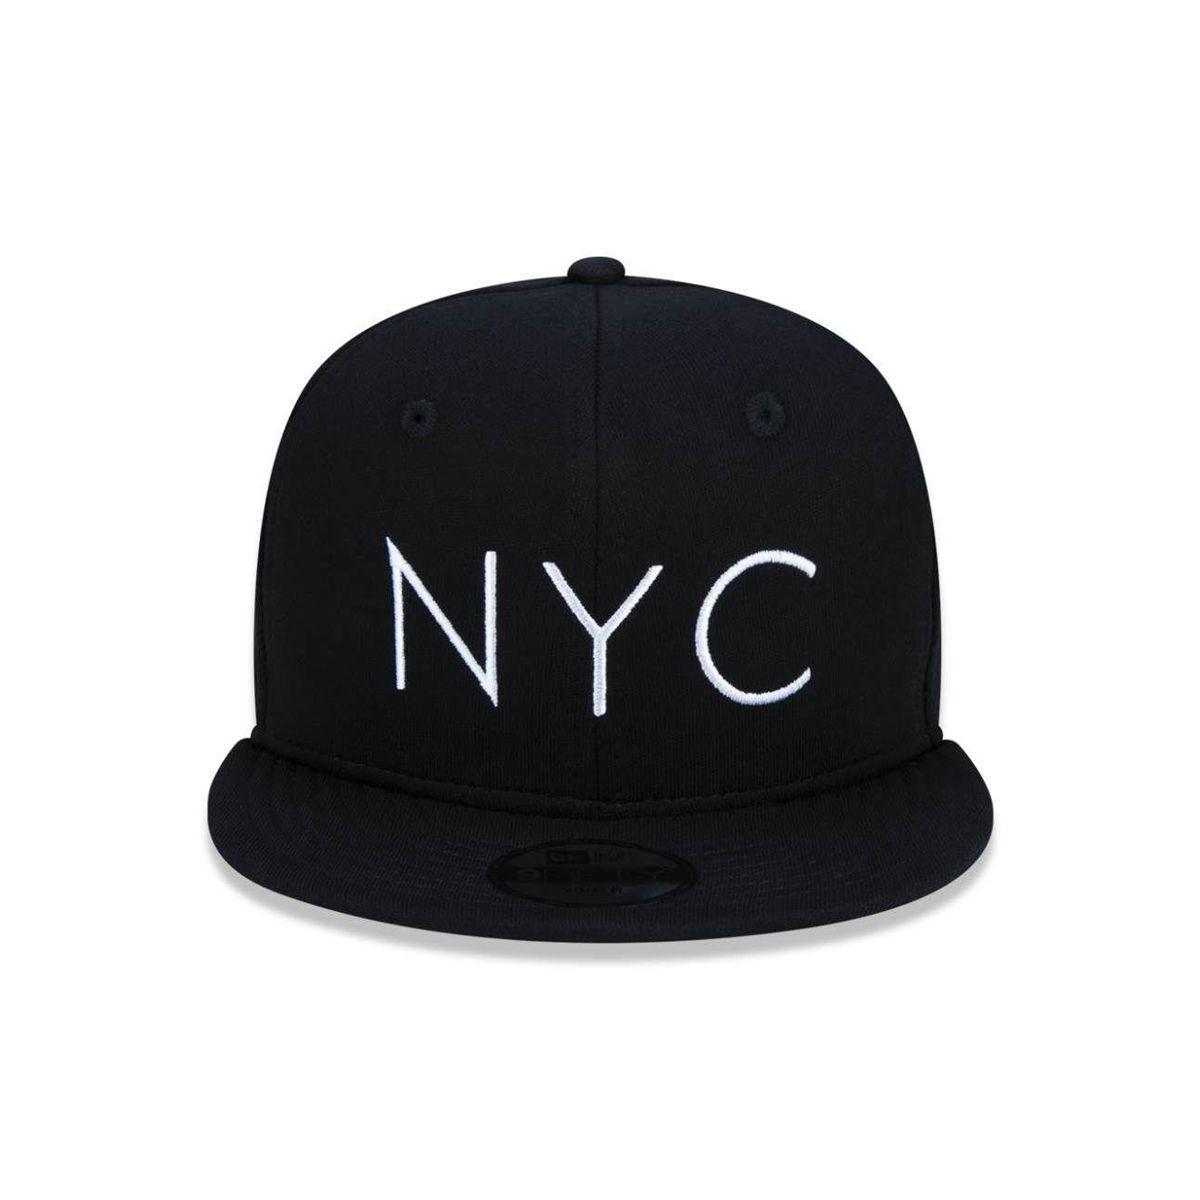 BONÉ 950 SN YOUTH SWAT NYC - NEW ERA